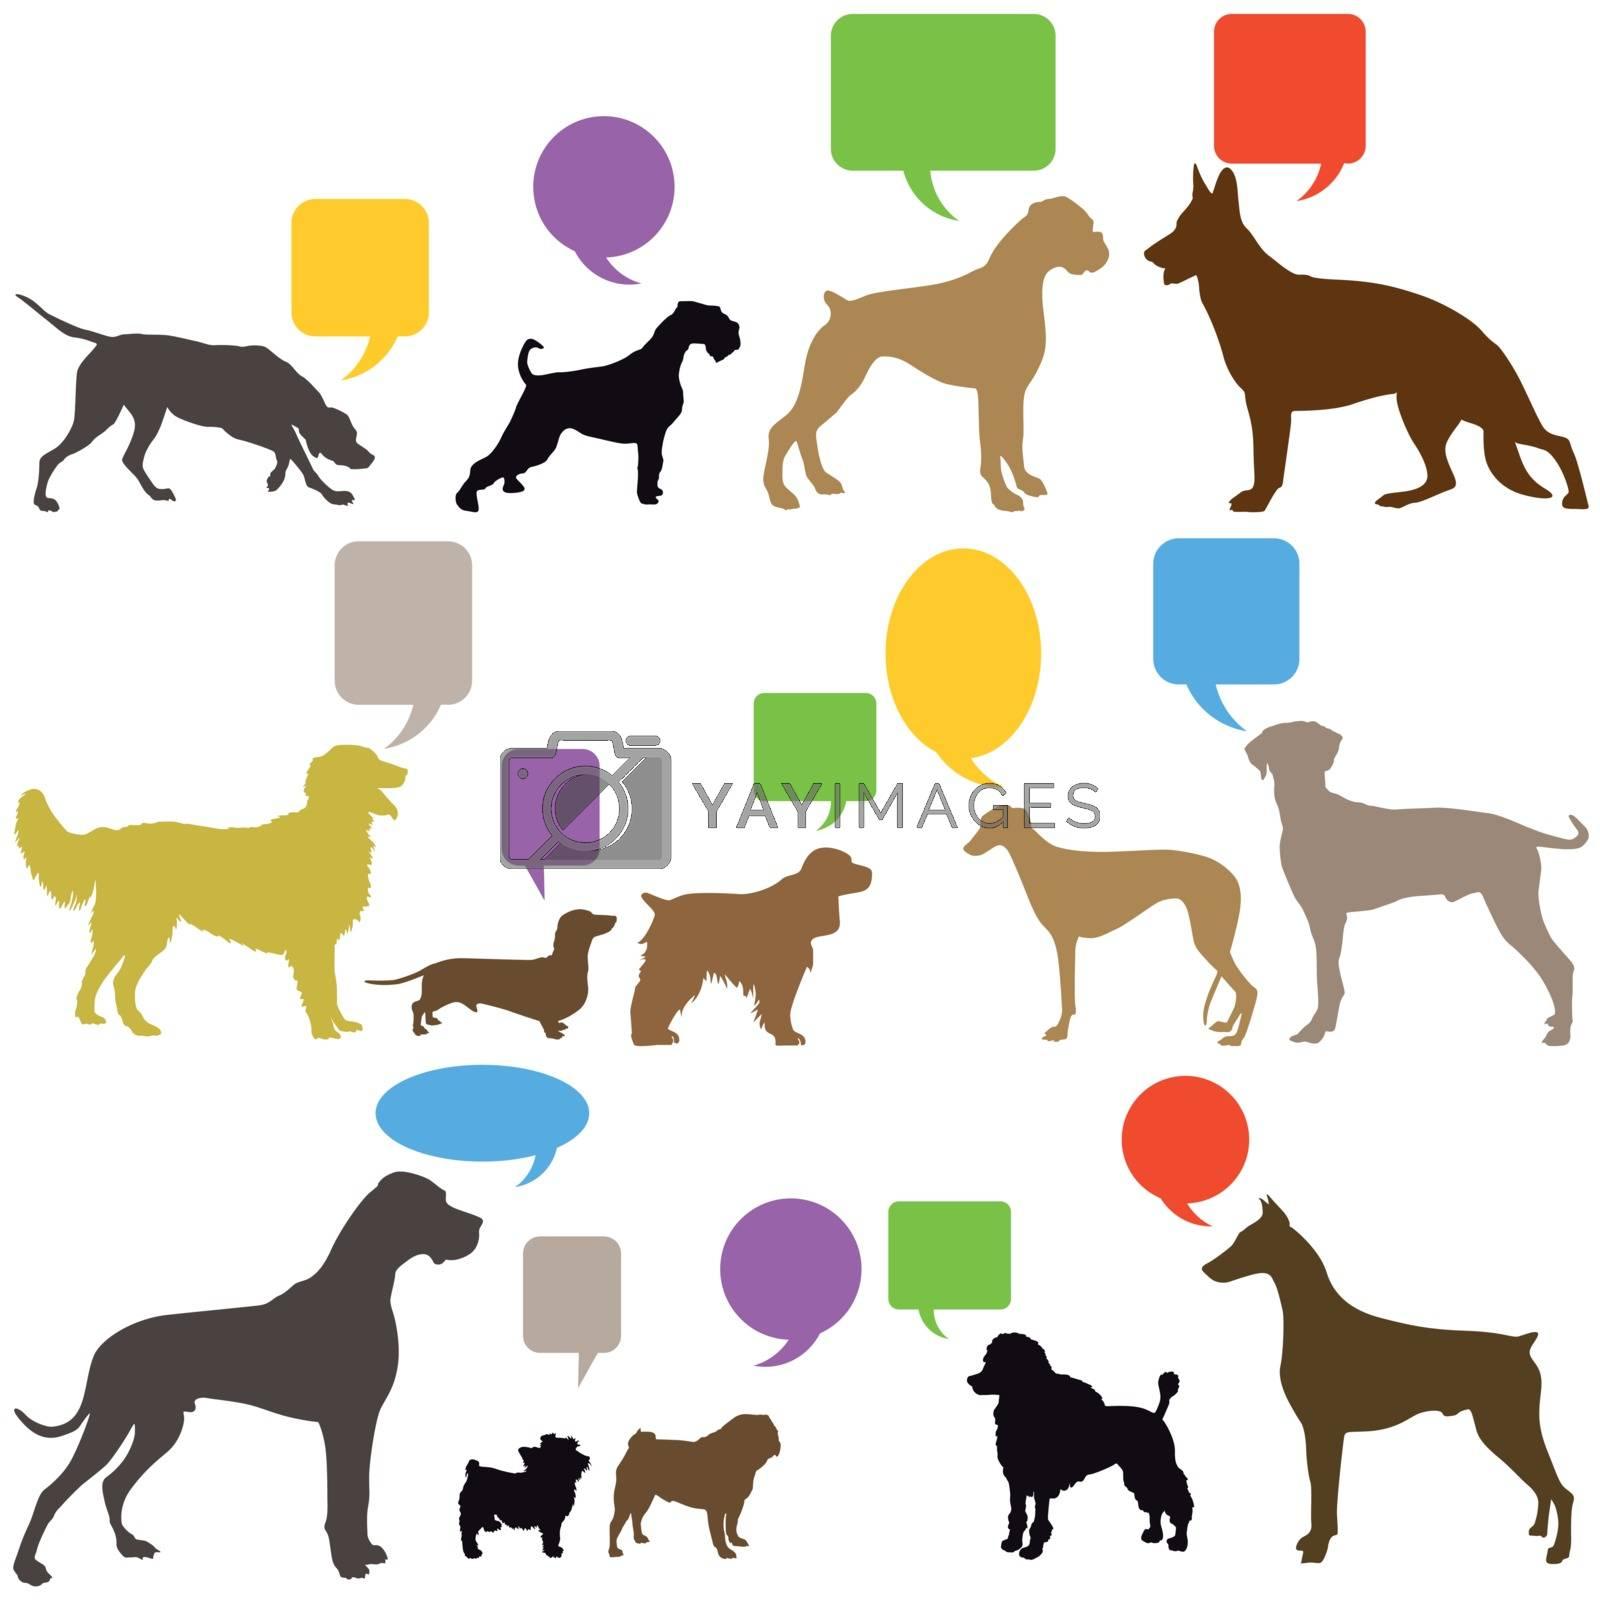 Royalty free image of Dog Sign Language by scusi